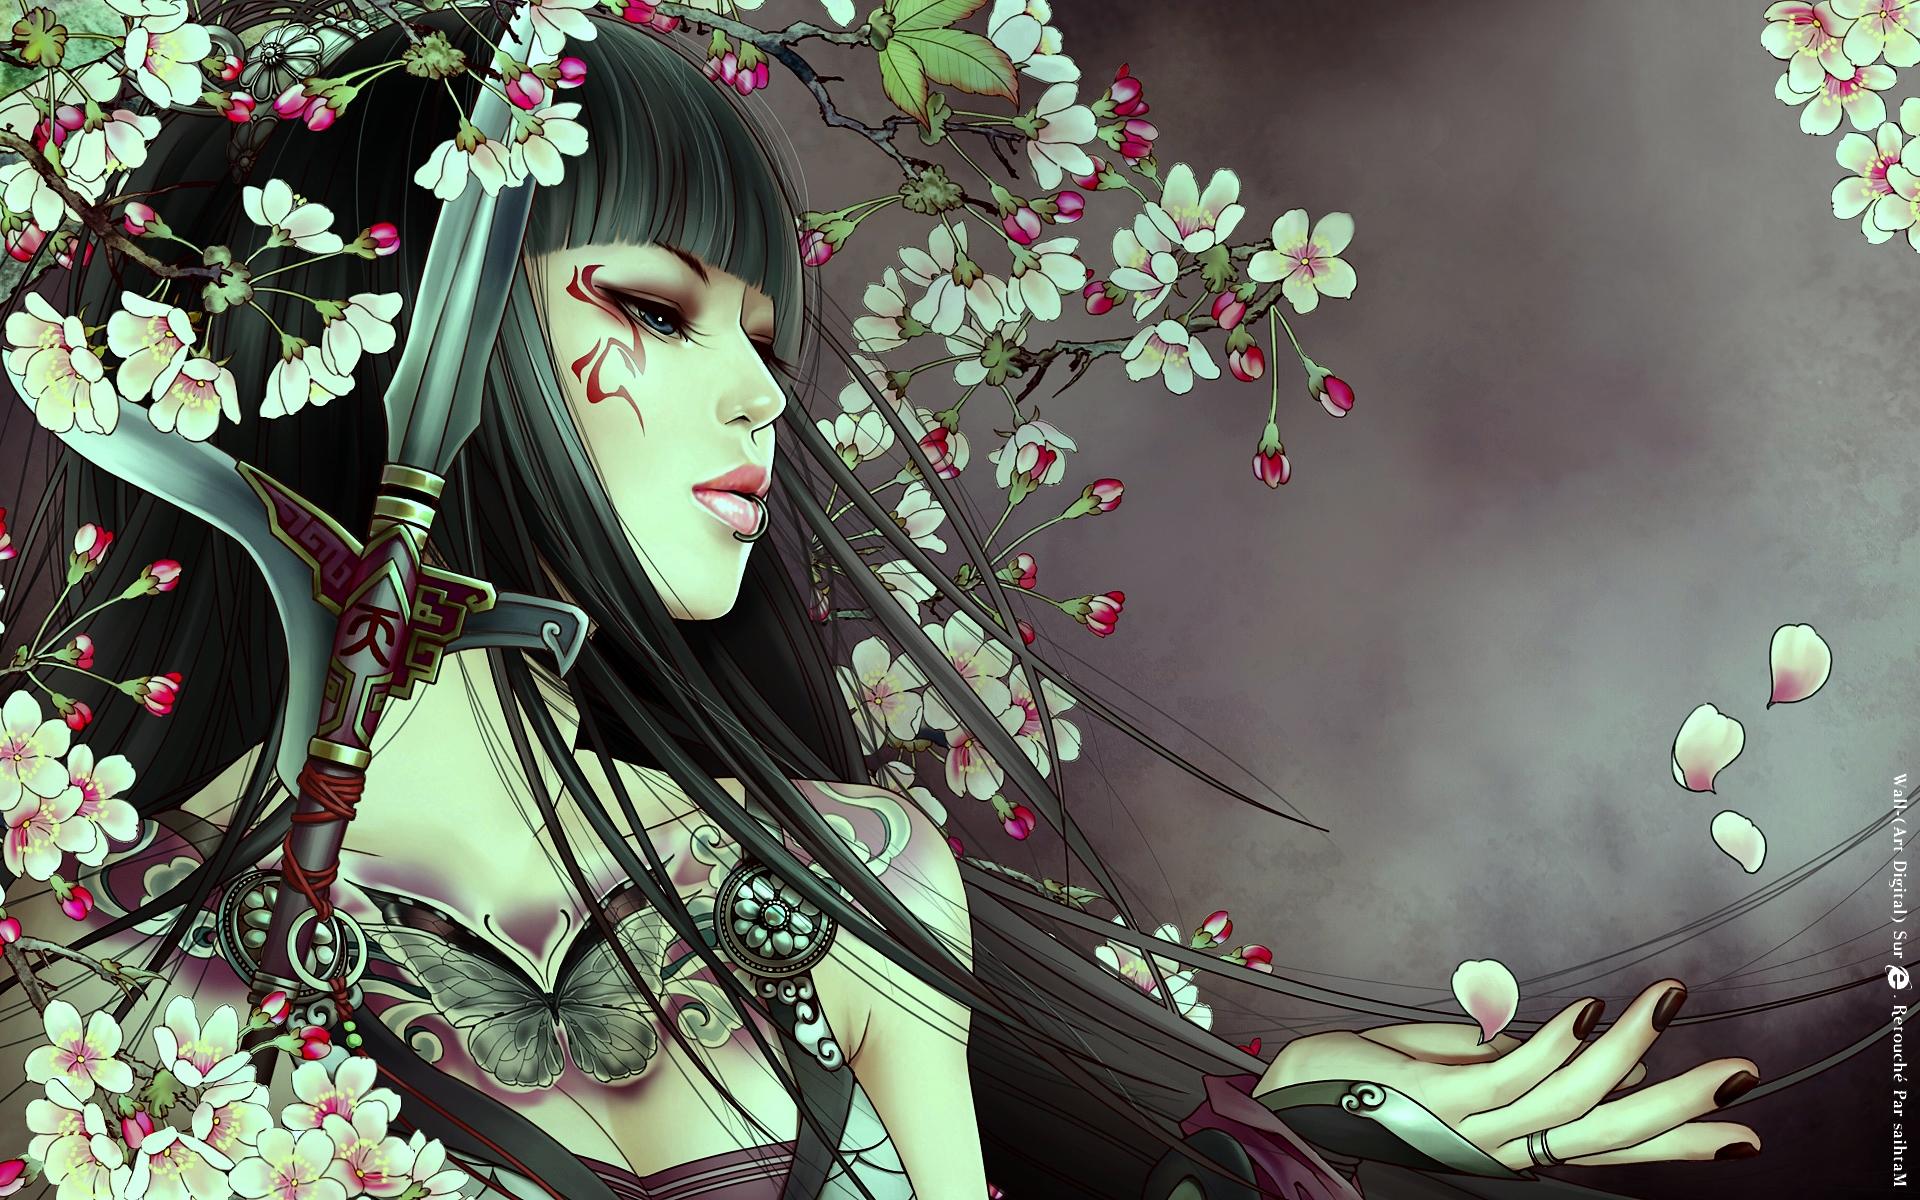 Asian beauty art id 43166 art abyss - Beautiful anime wallpaper hd ...